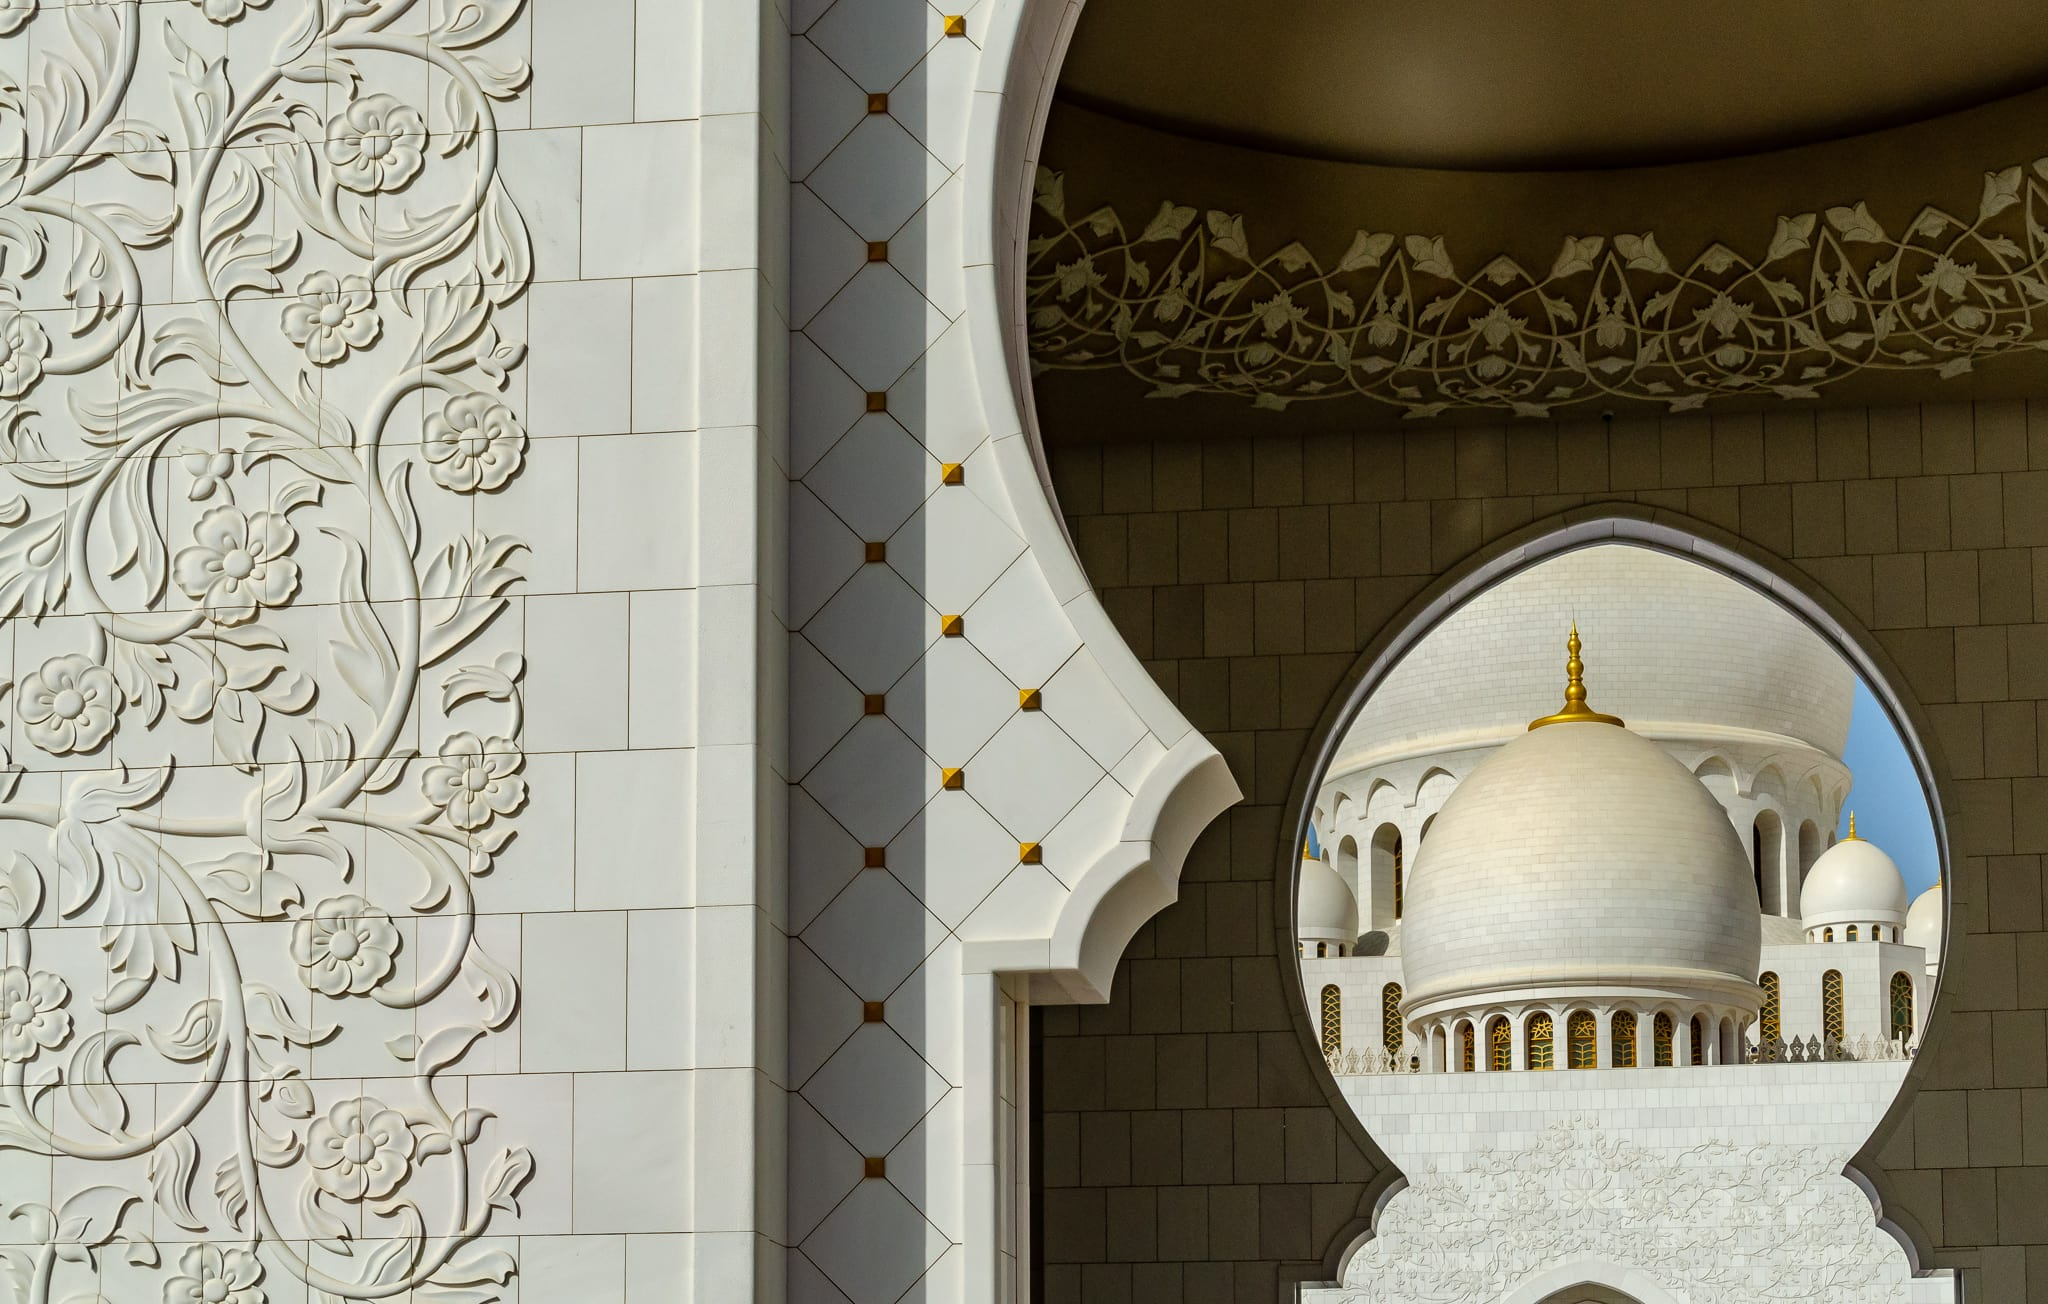 Sheikh Zayed Mosque, Abu Dhabi #abudhabi #sheikhzayedmosque